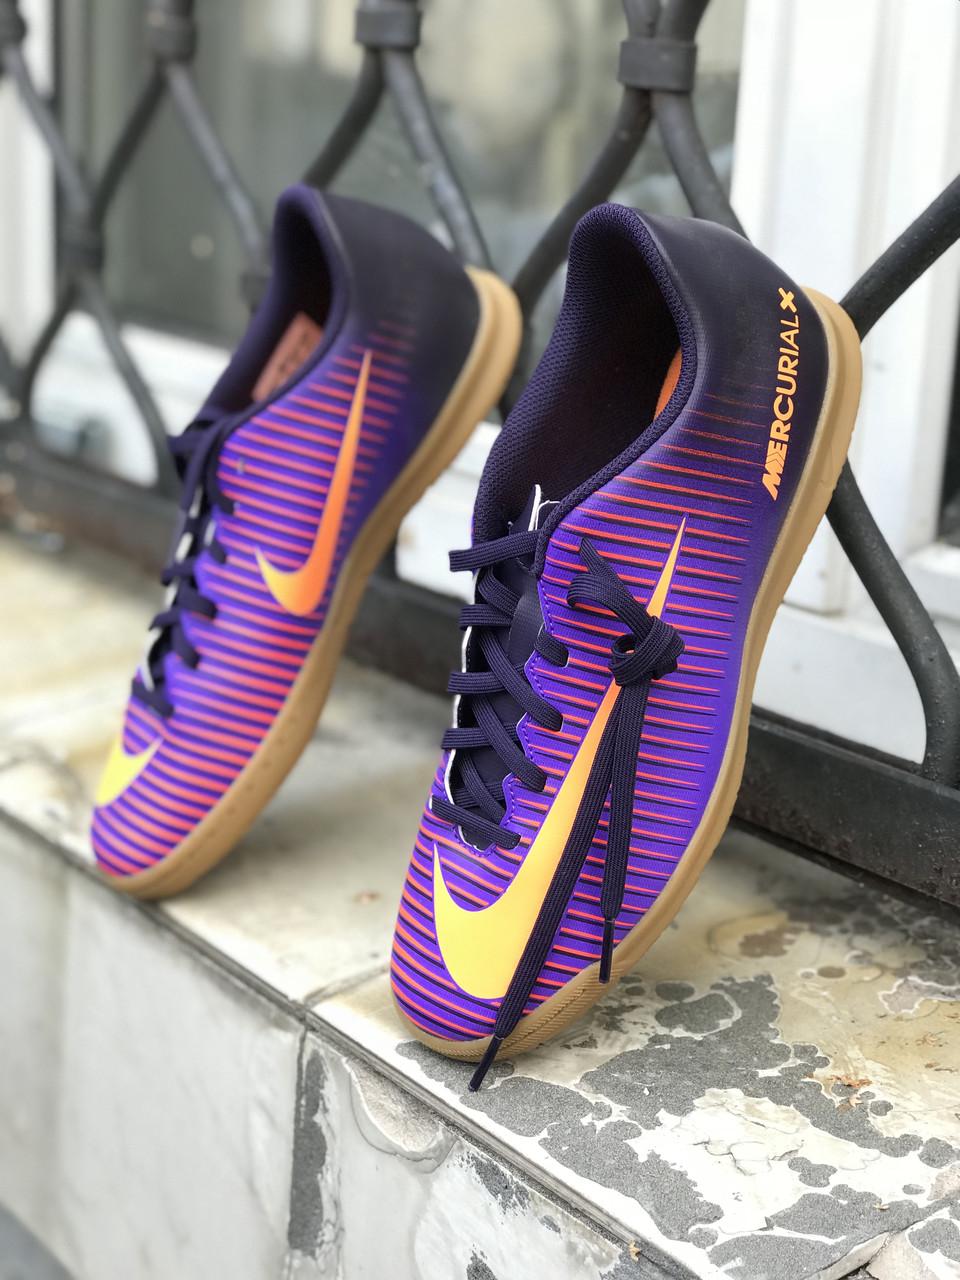 b8144514af46 Футзалки Nike MERCURIALX VORTEX III IC 831970-585 (Оригинал) - Football  Mall -